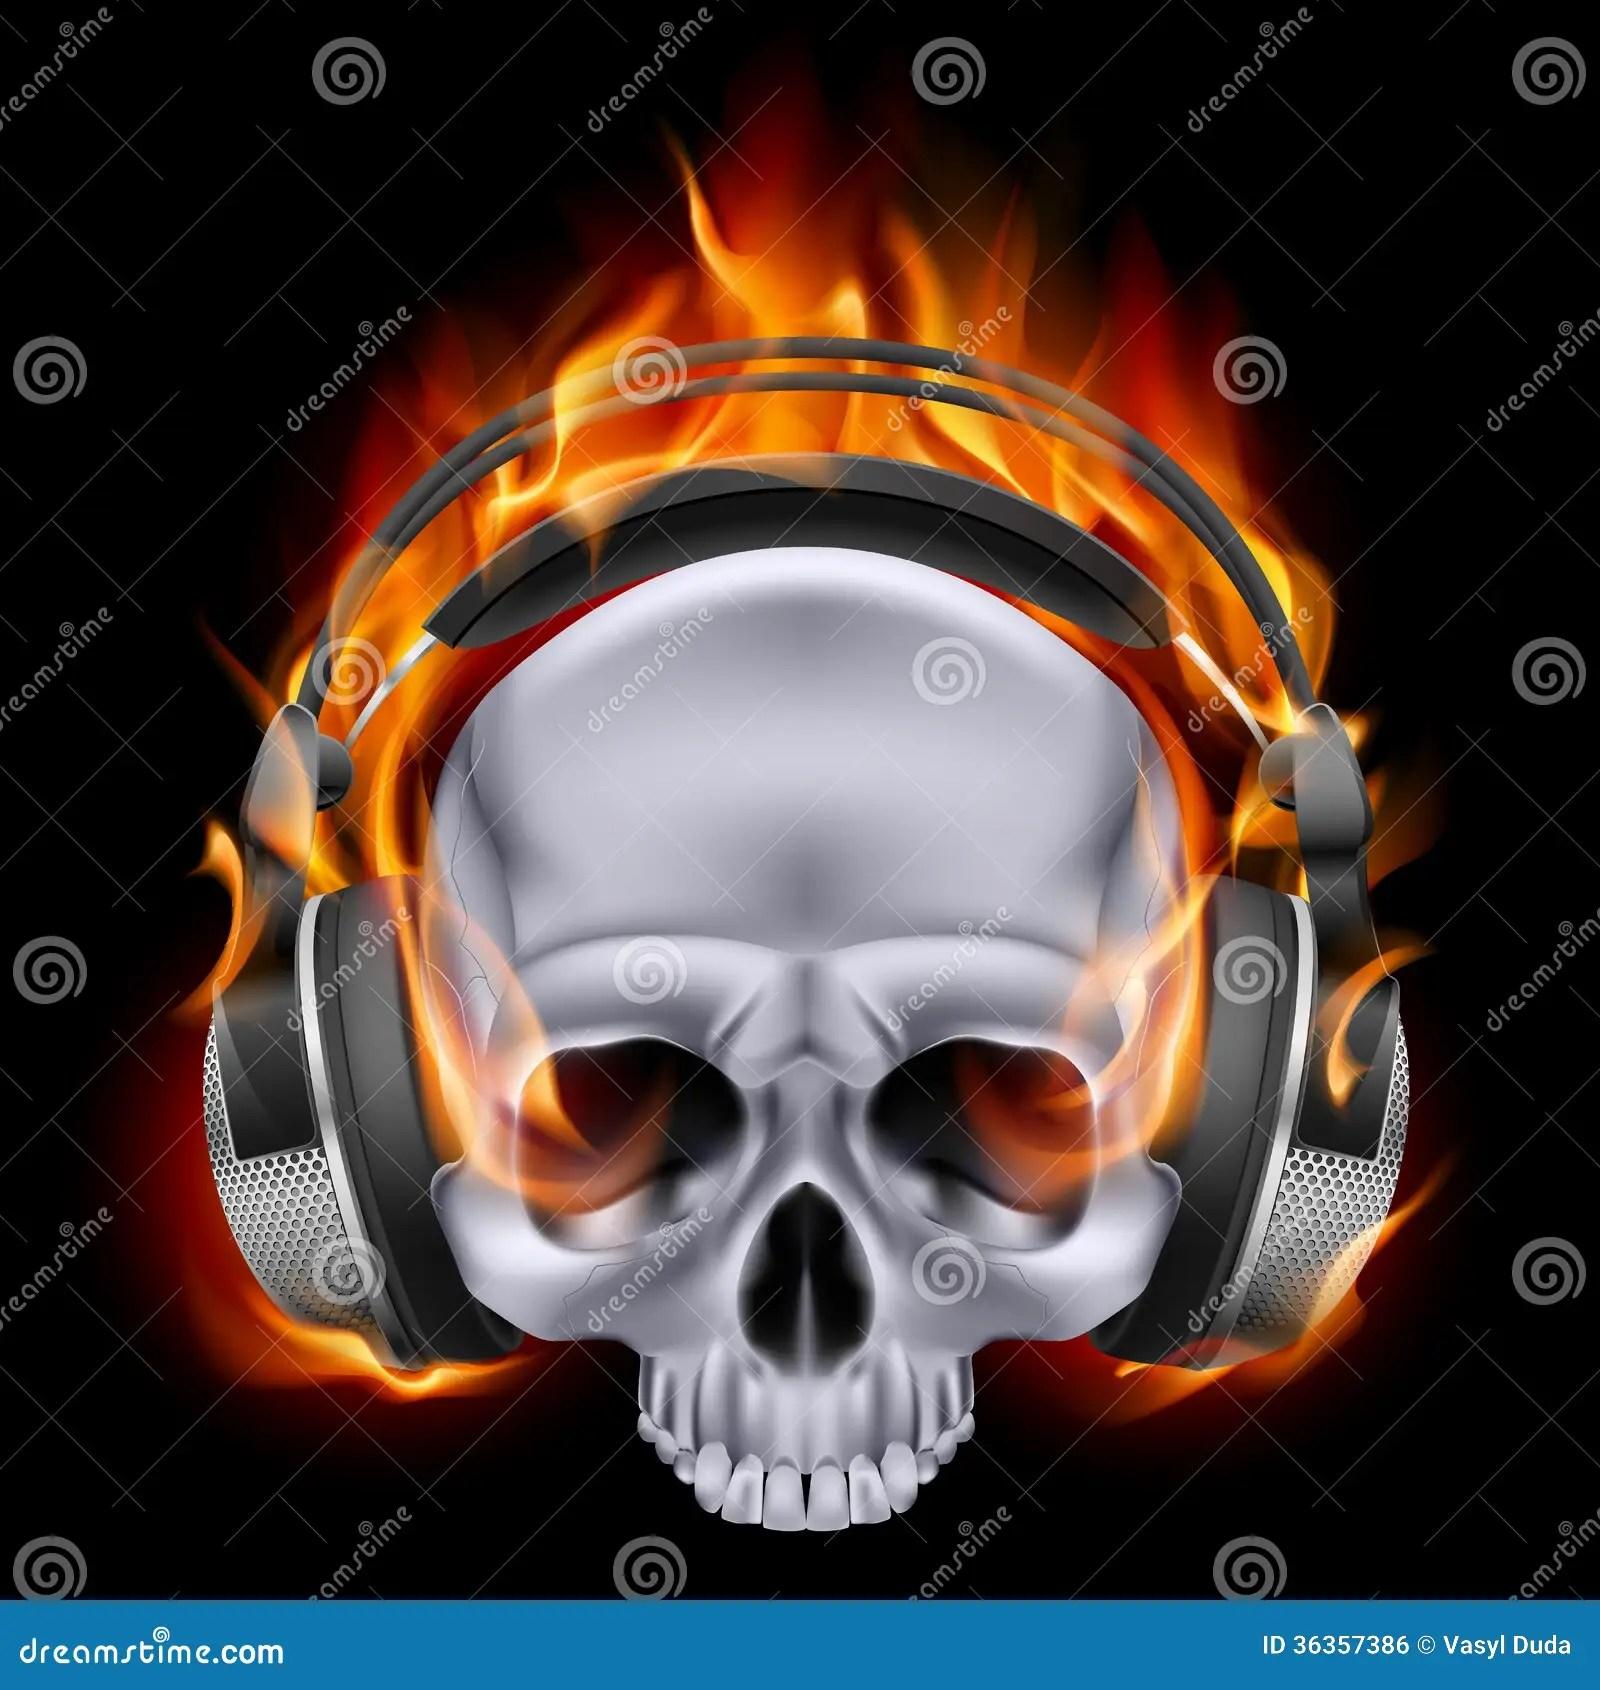 Confederate Flag Wallpaper Hd Flaming Skull In Headphones Stock Vector Image 36357386